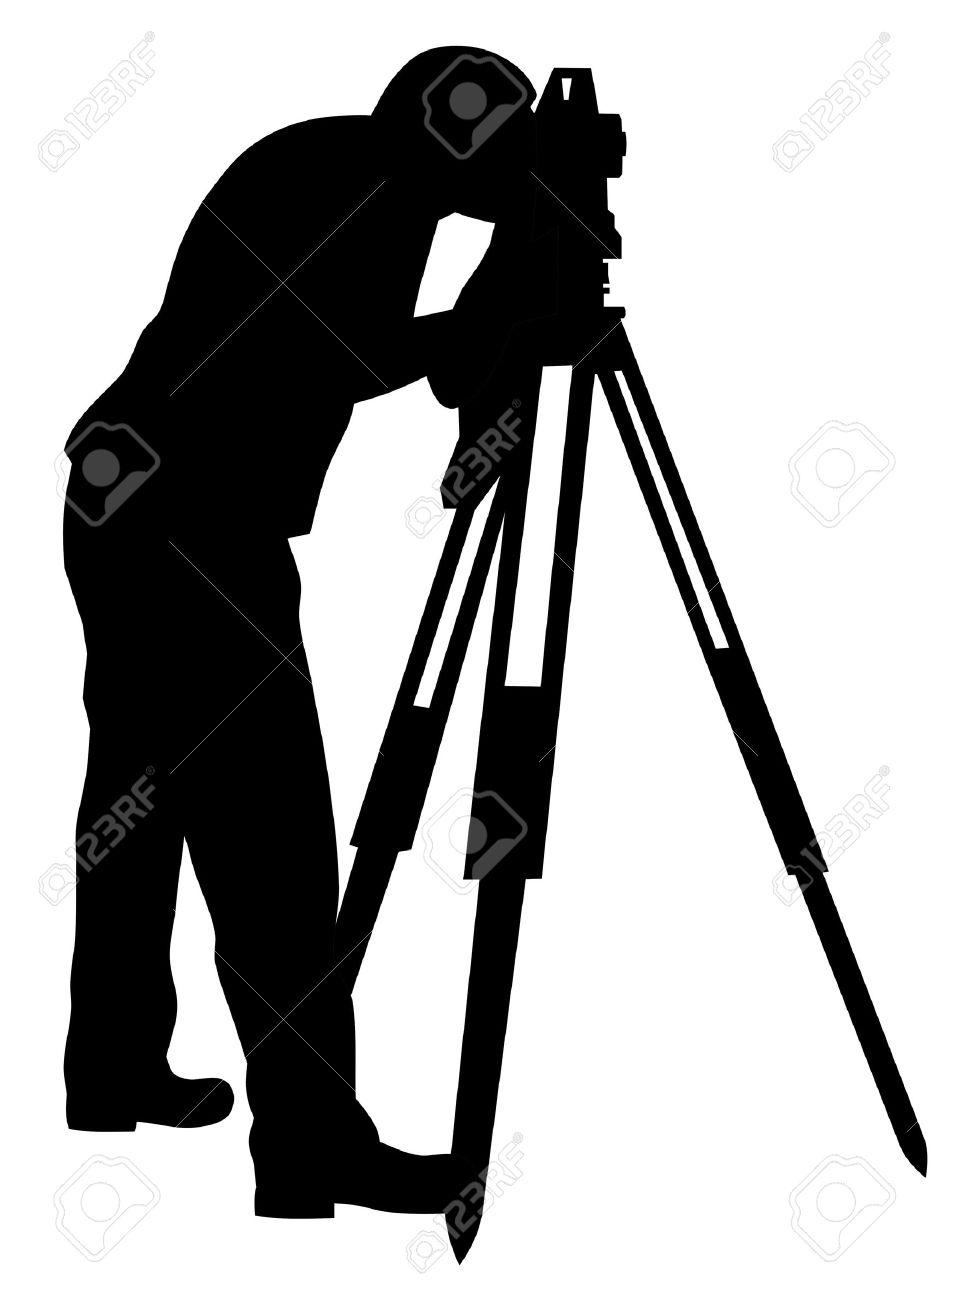 Abstract vector illustration of land surveyor silhouette Stock Vector - 9861021